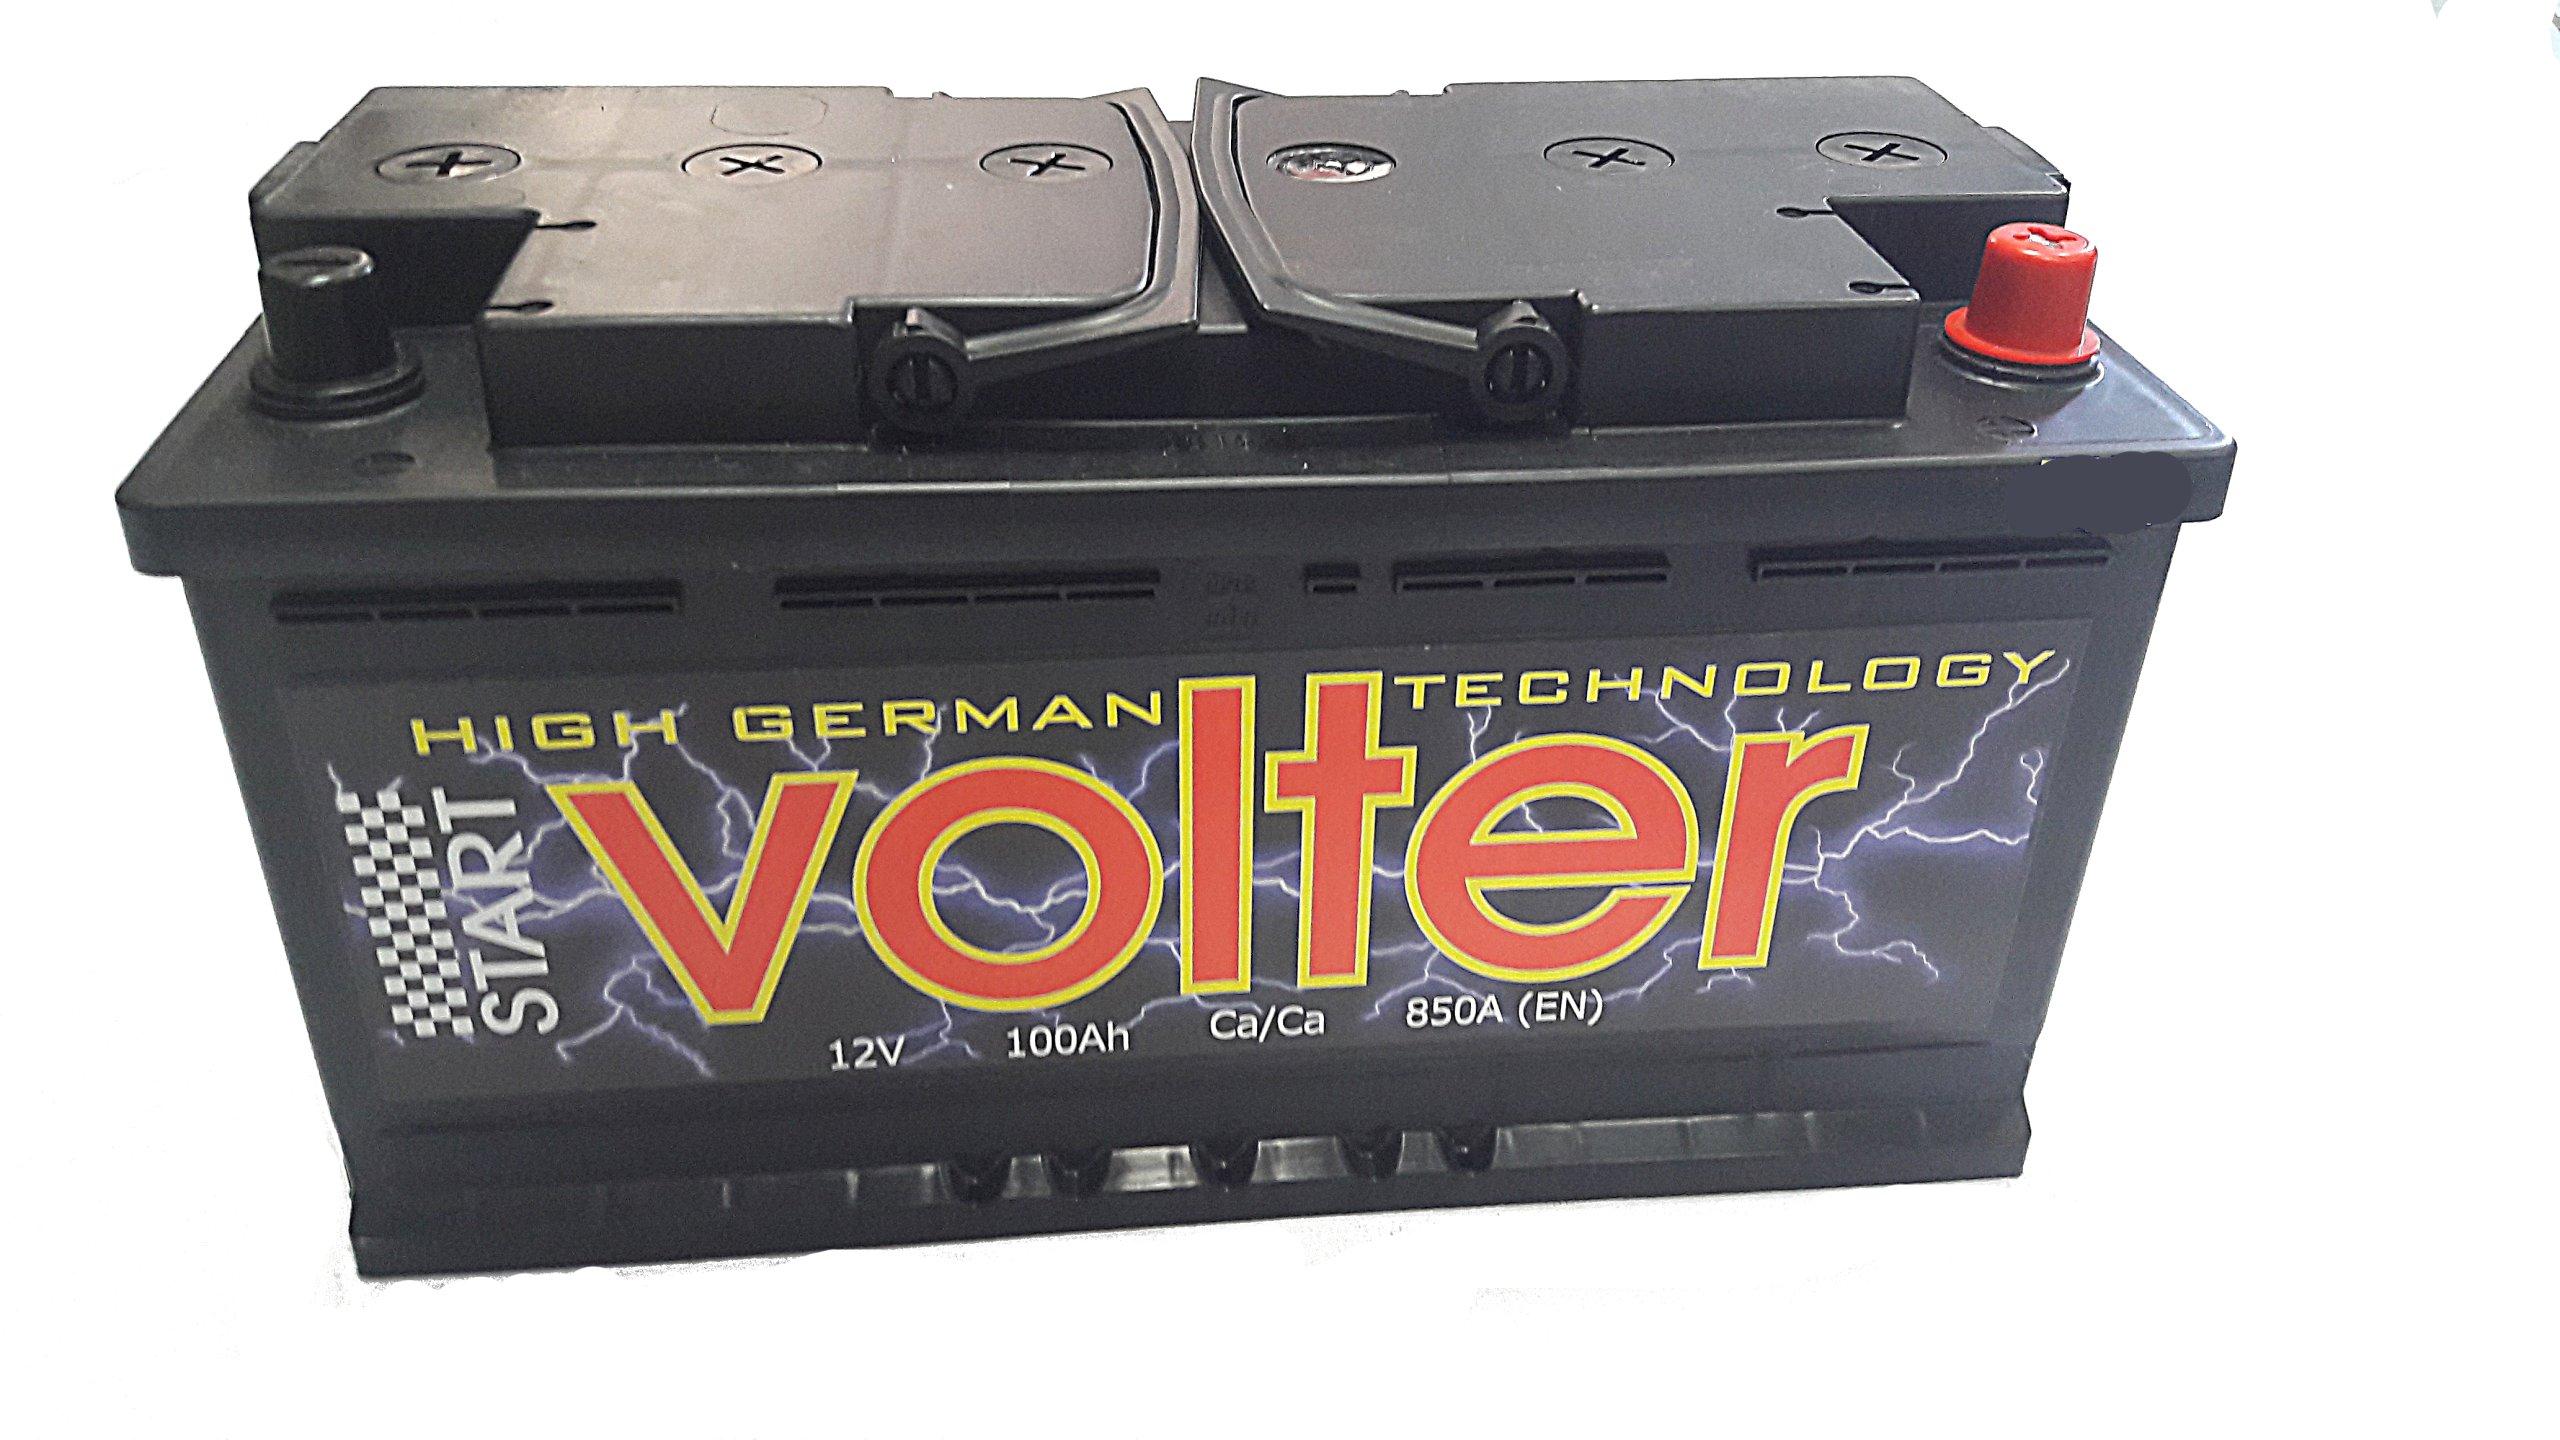 аккумулятор volter 100 ах 850a